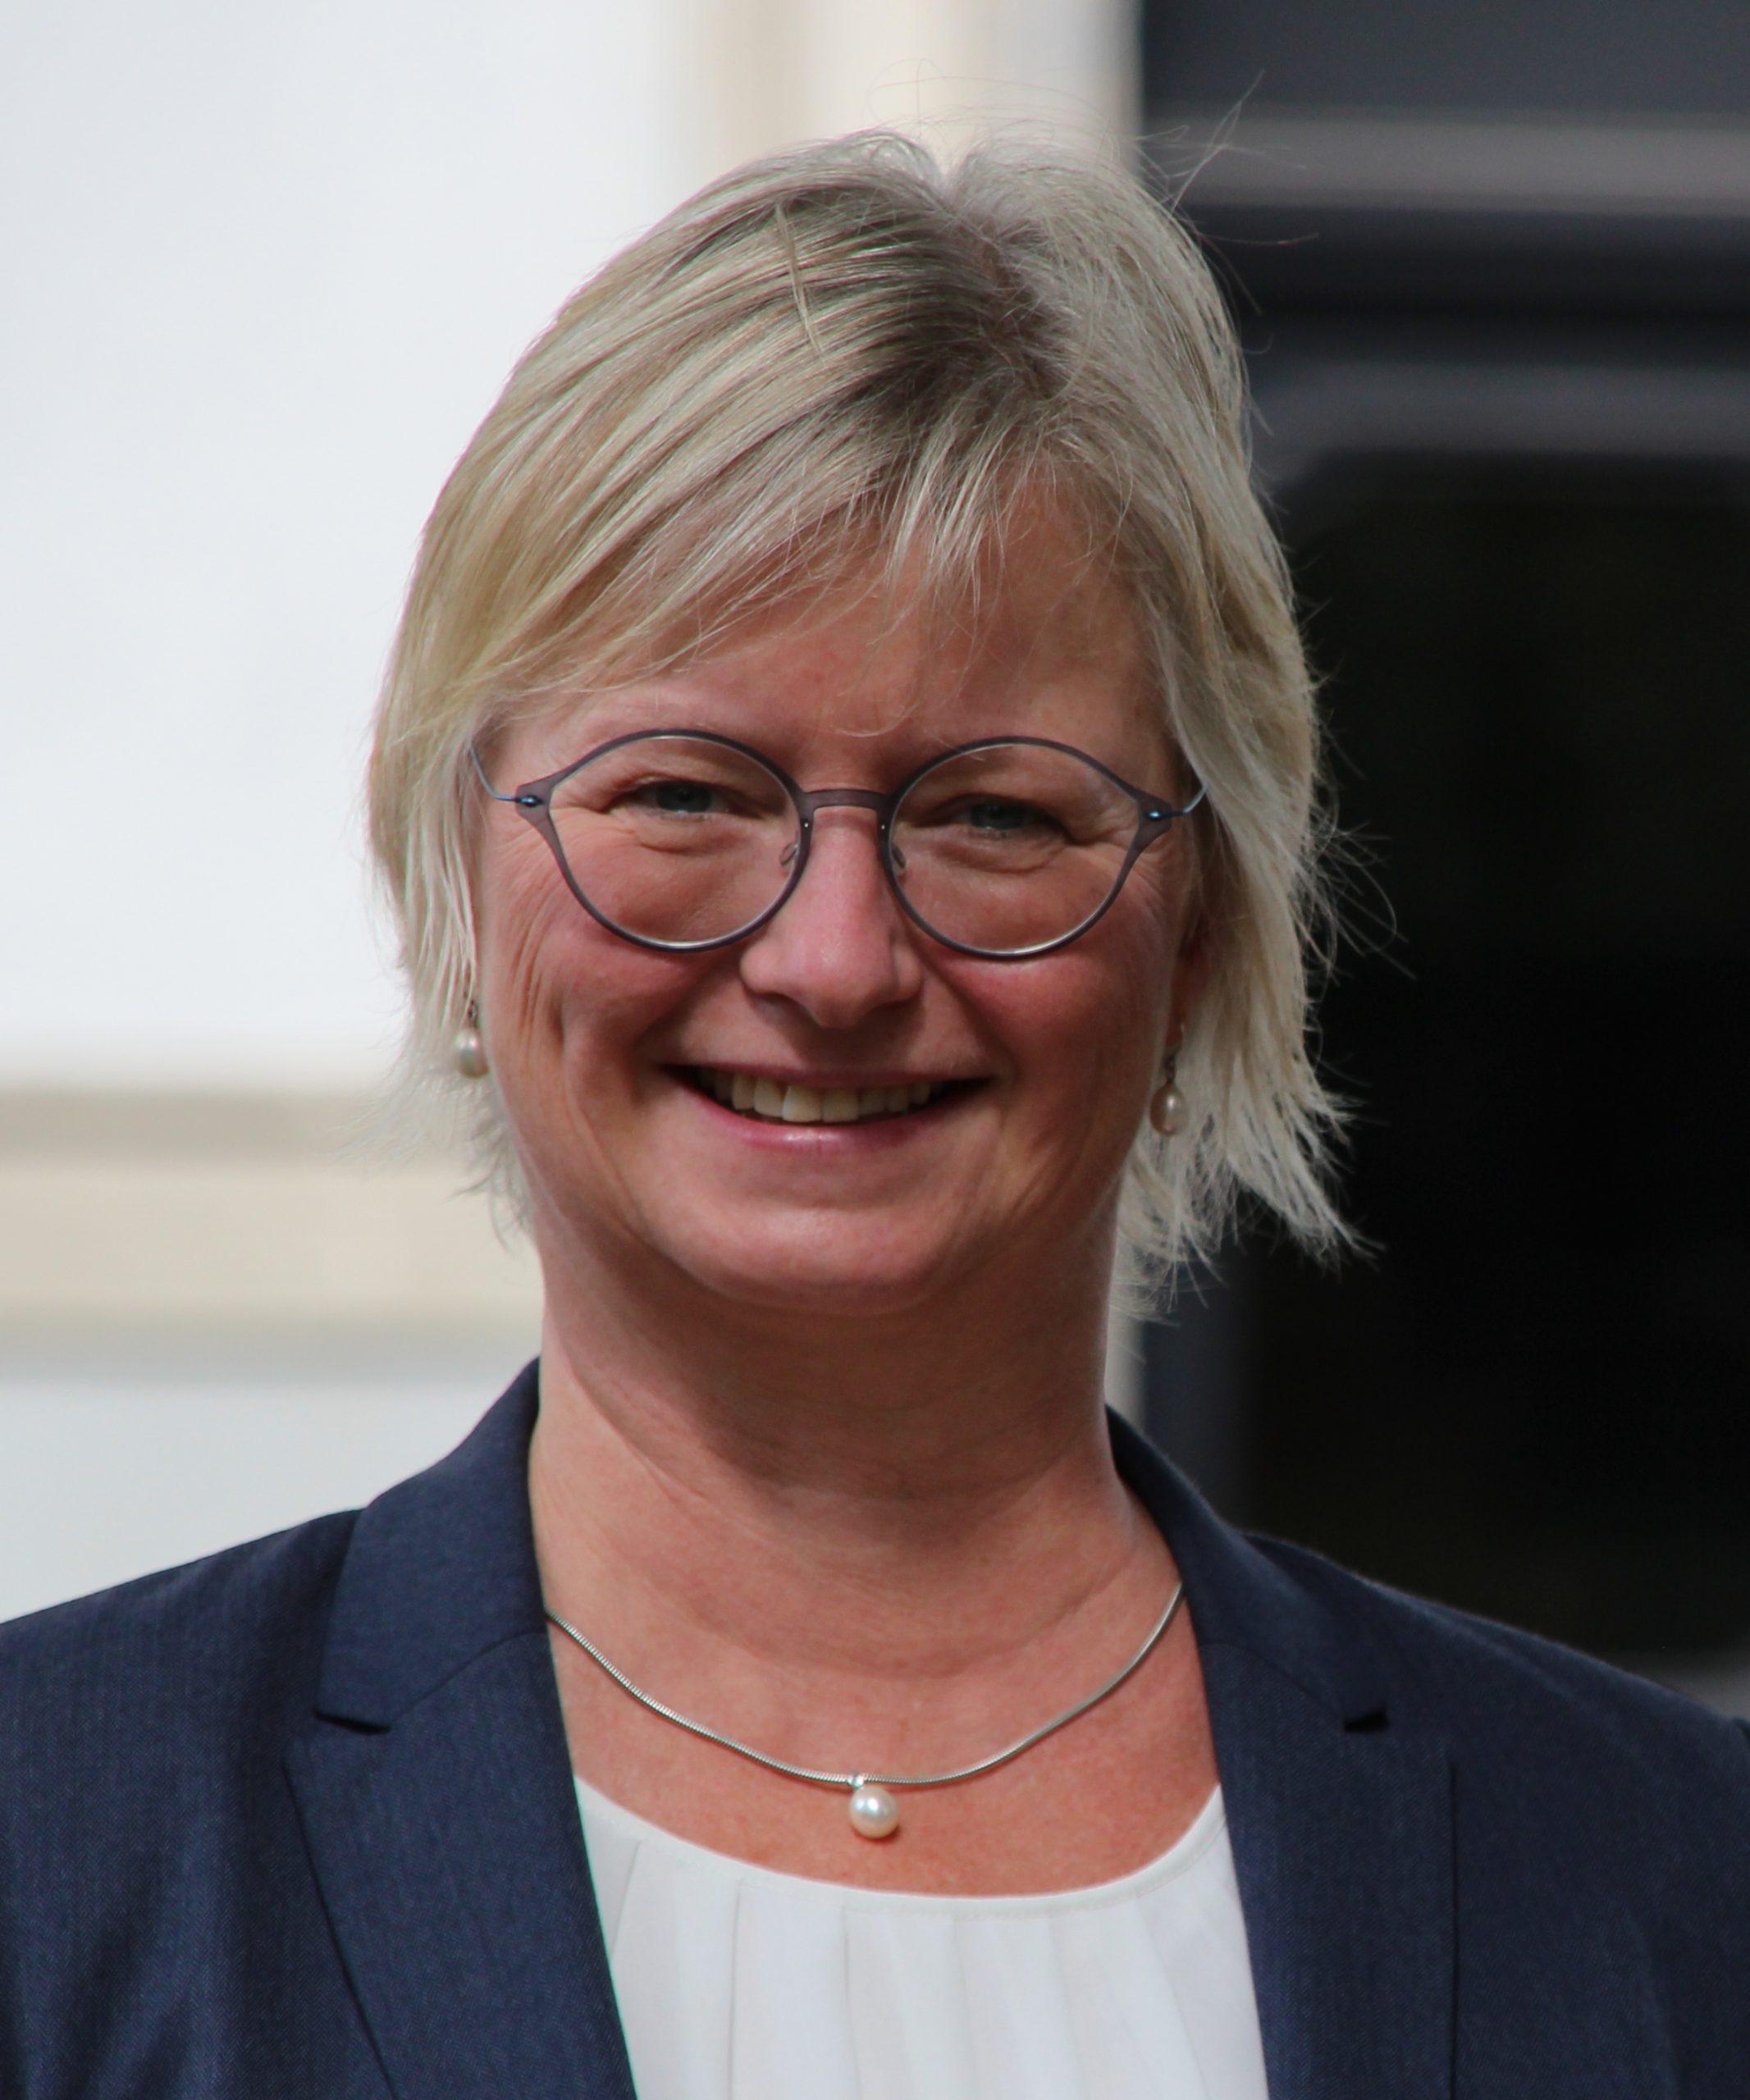 Ute Brauckhoff